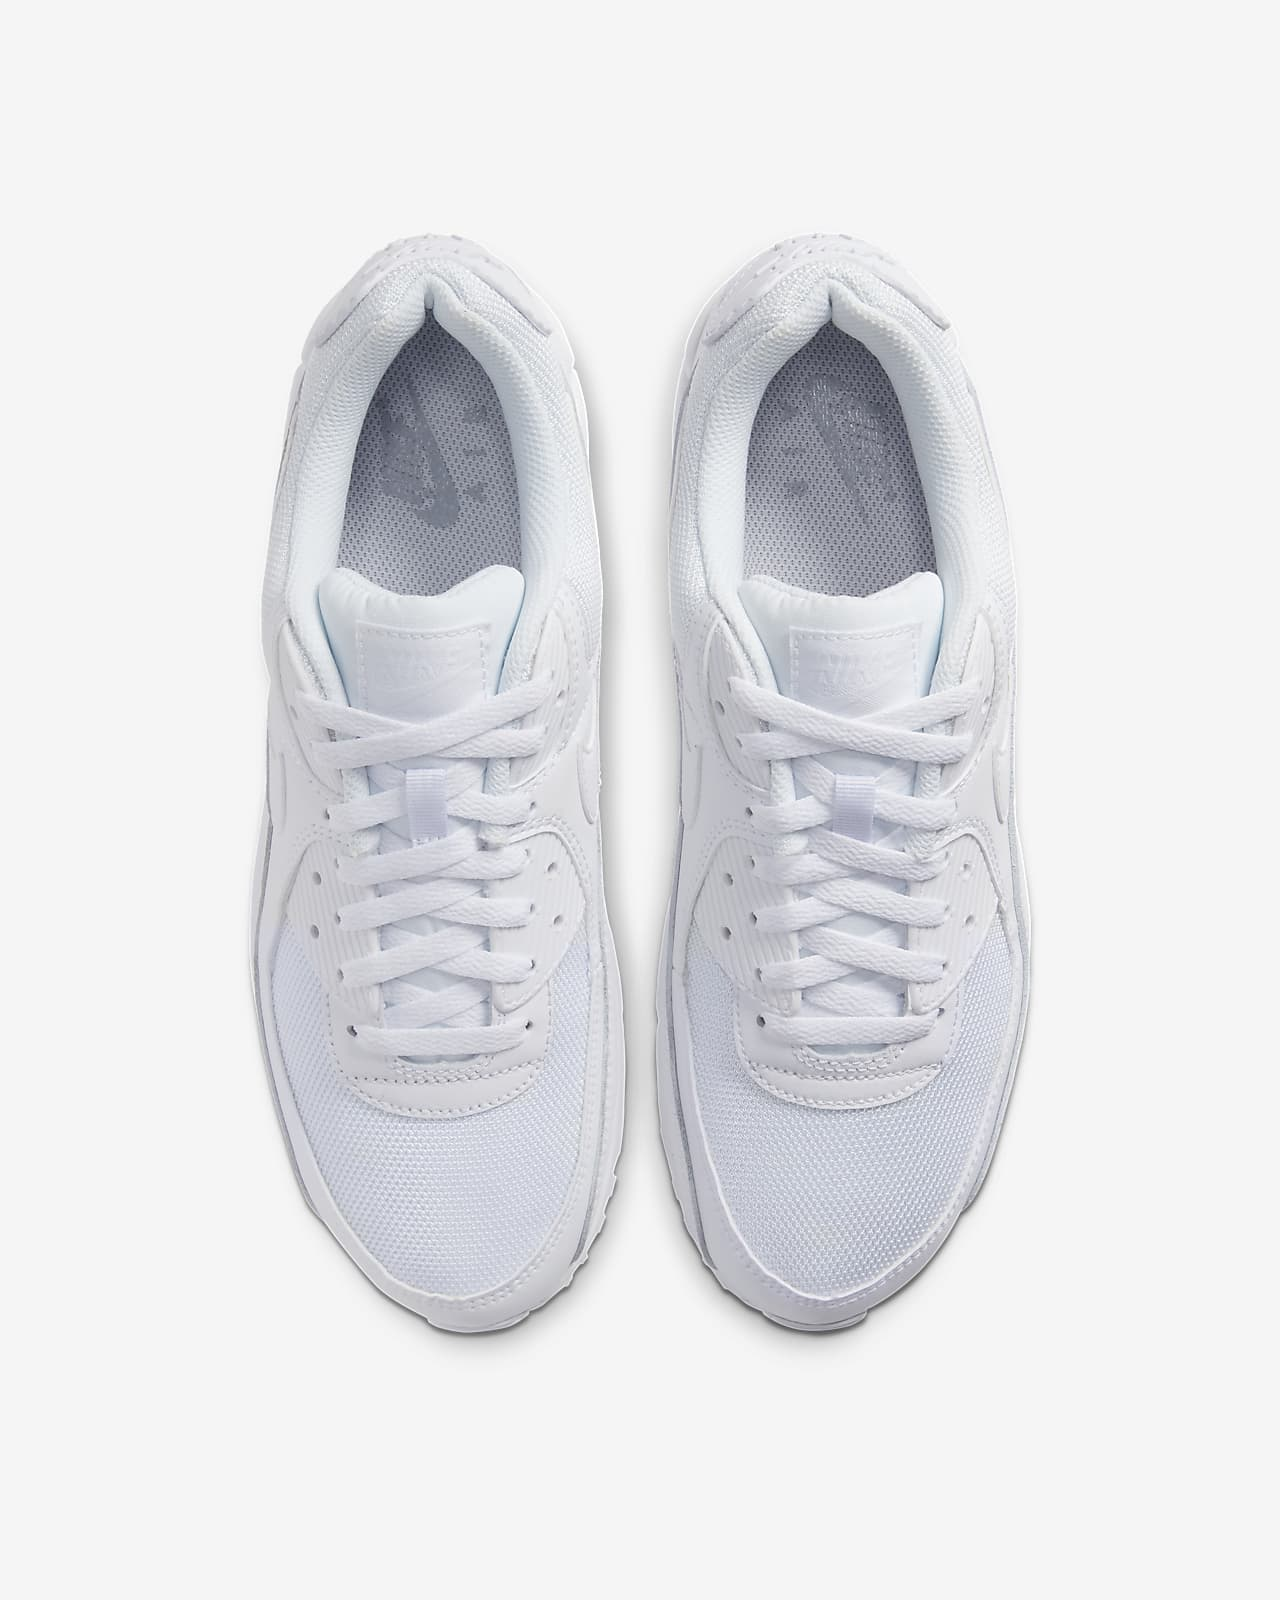 air max 90 hombre blancas tela